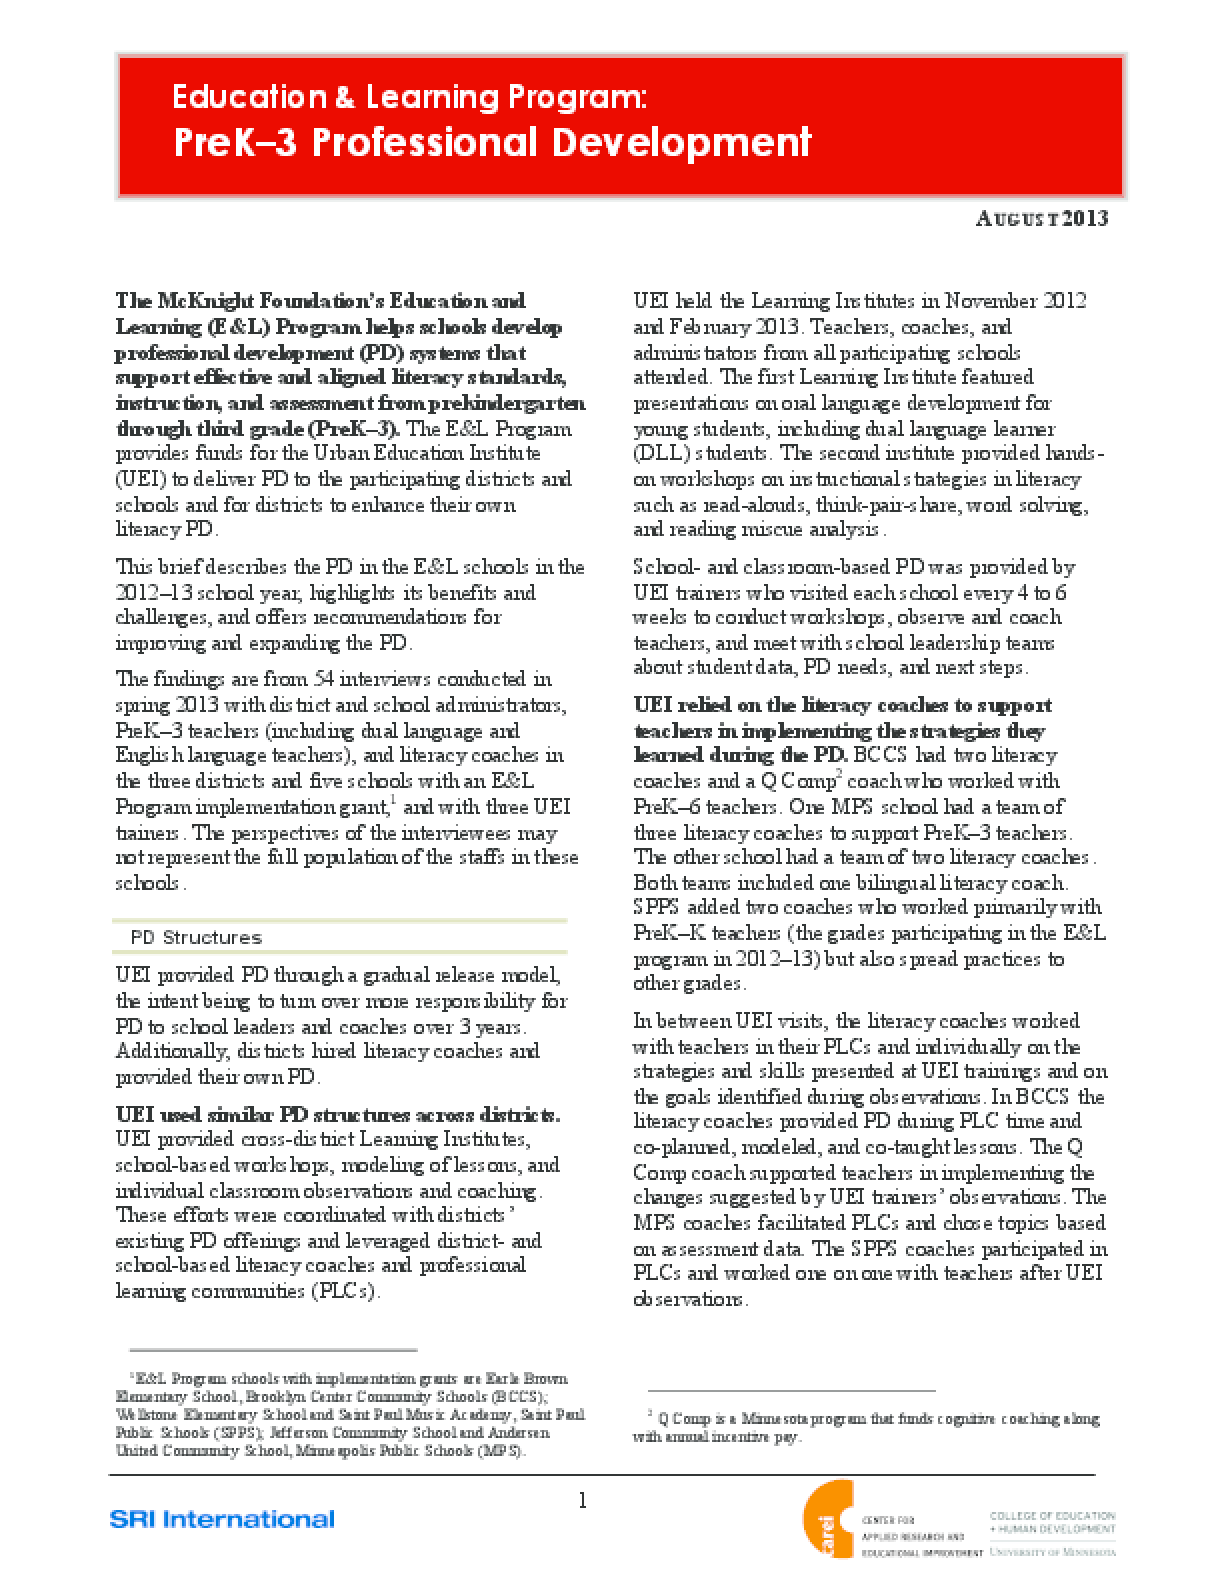 PreK-3 Professional Development Evaluation Brief